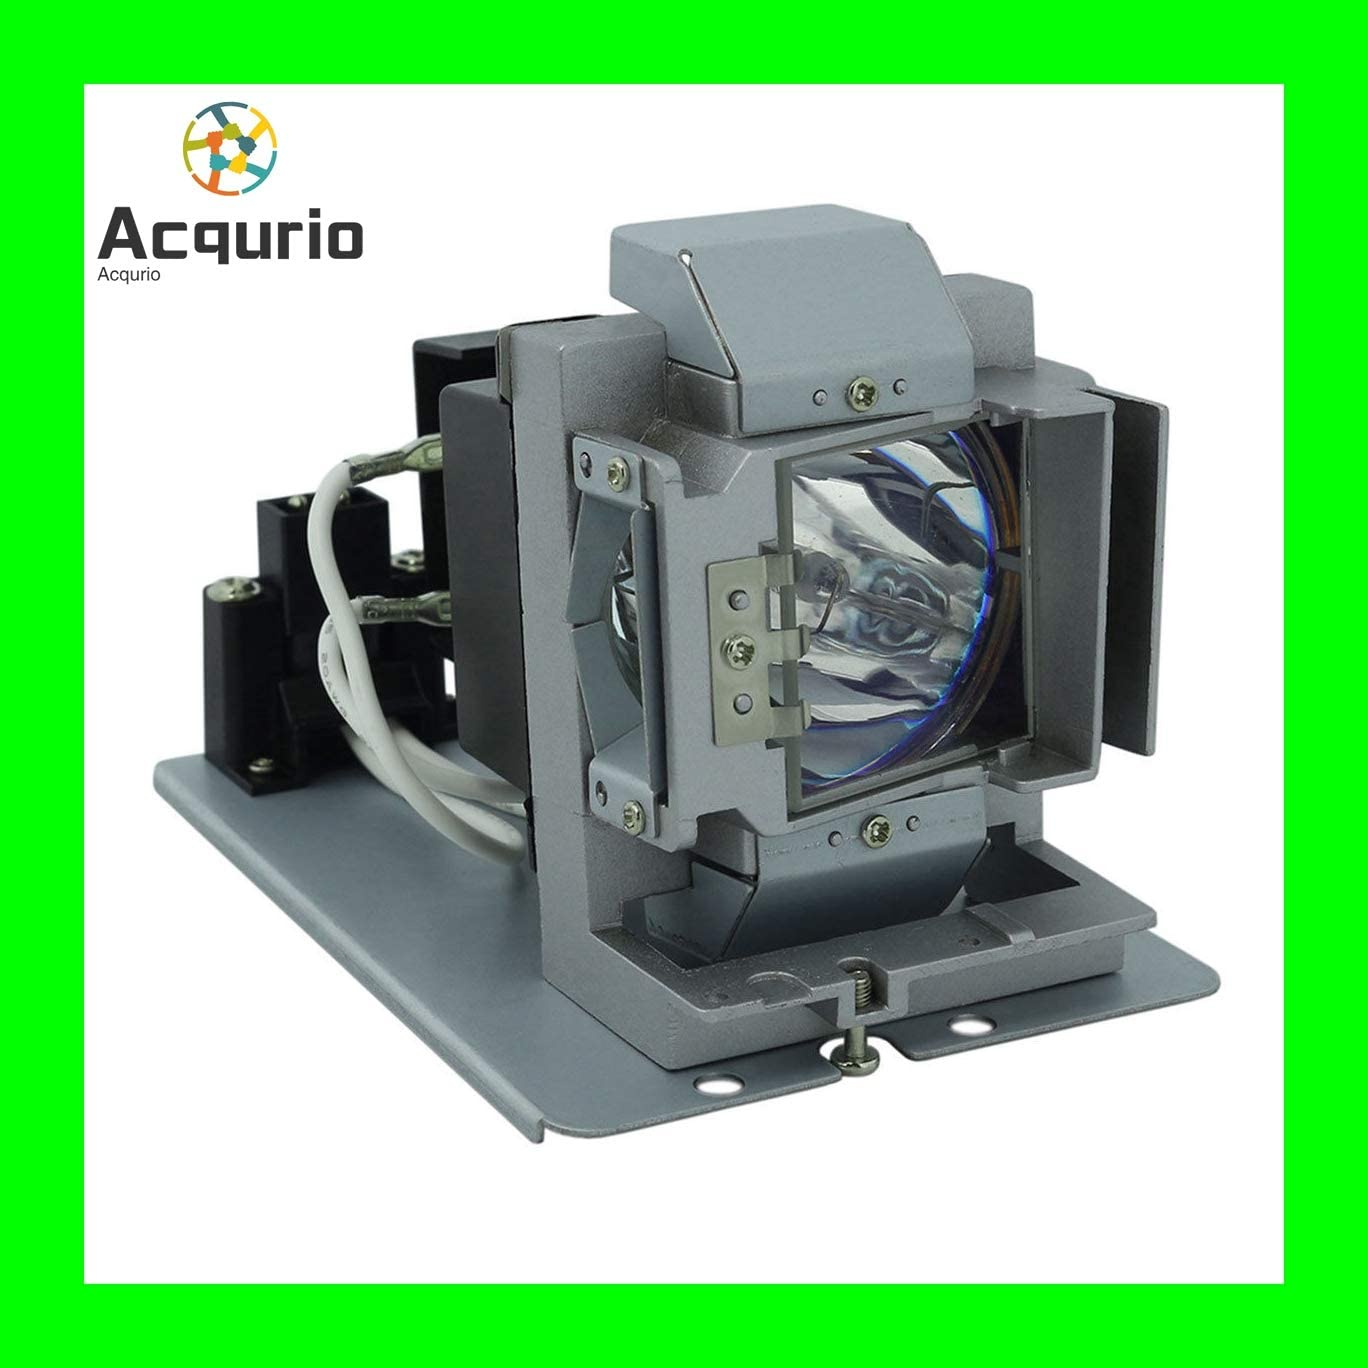 Lámpara para Canon LV-WX300UST, LV-WX300USTi, LVWX300UST ...